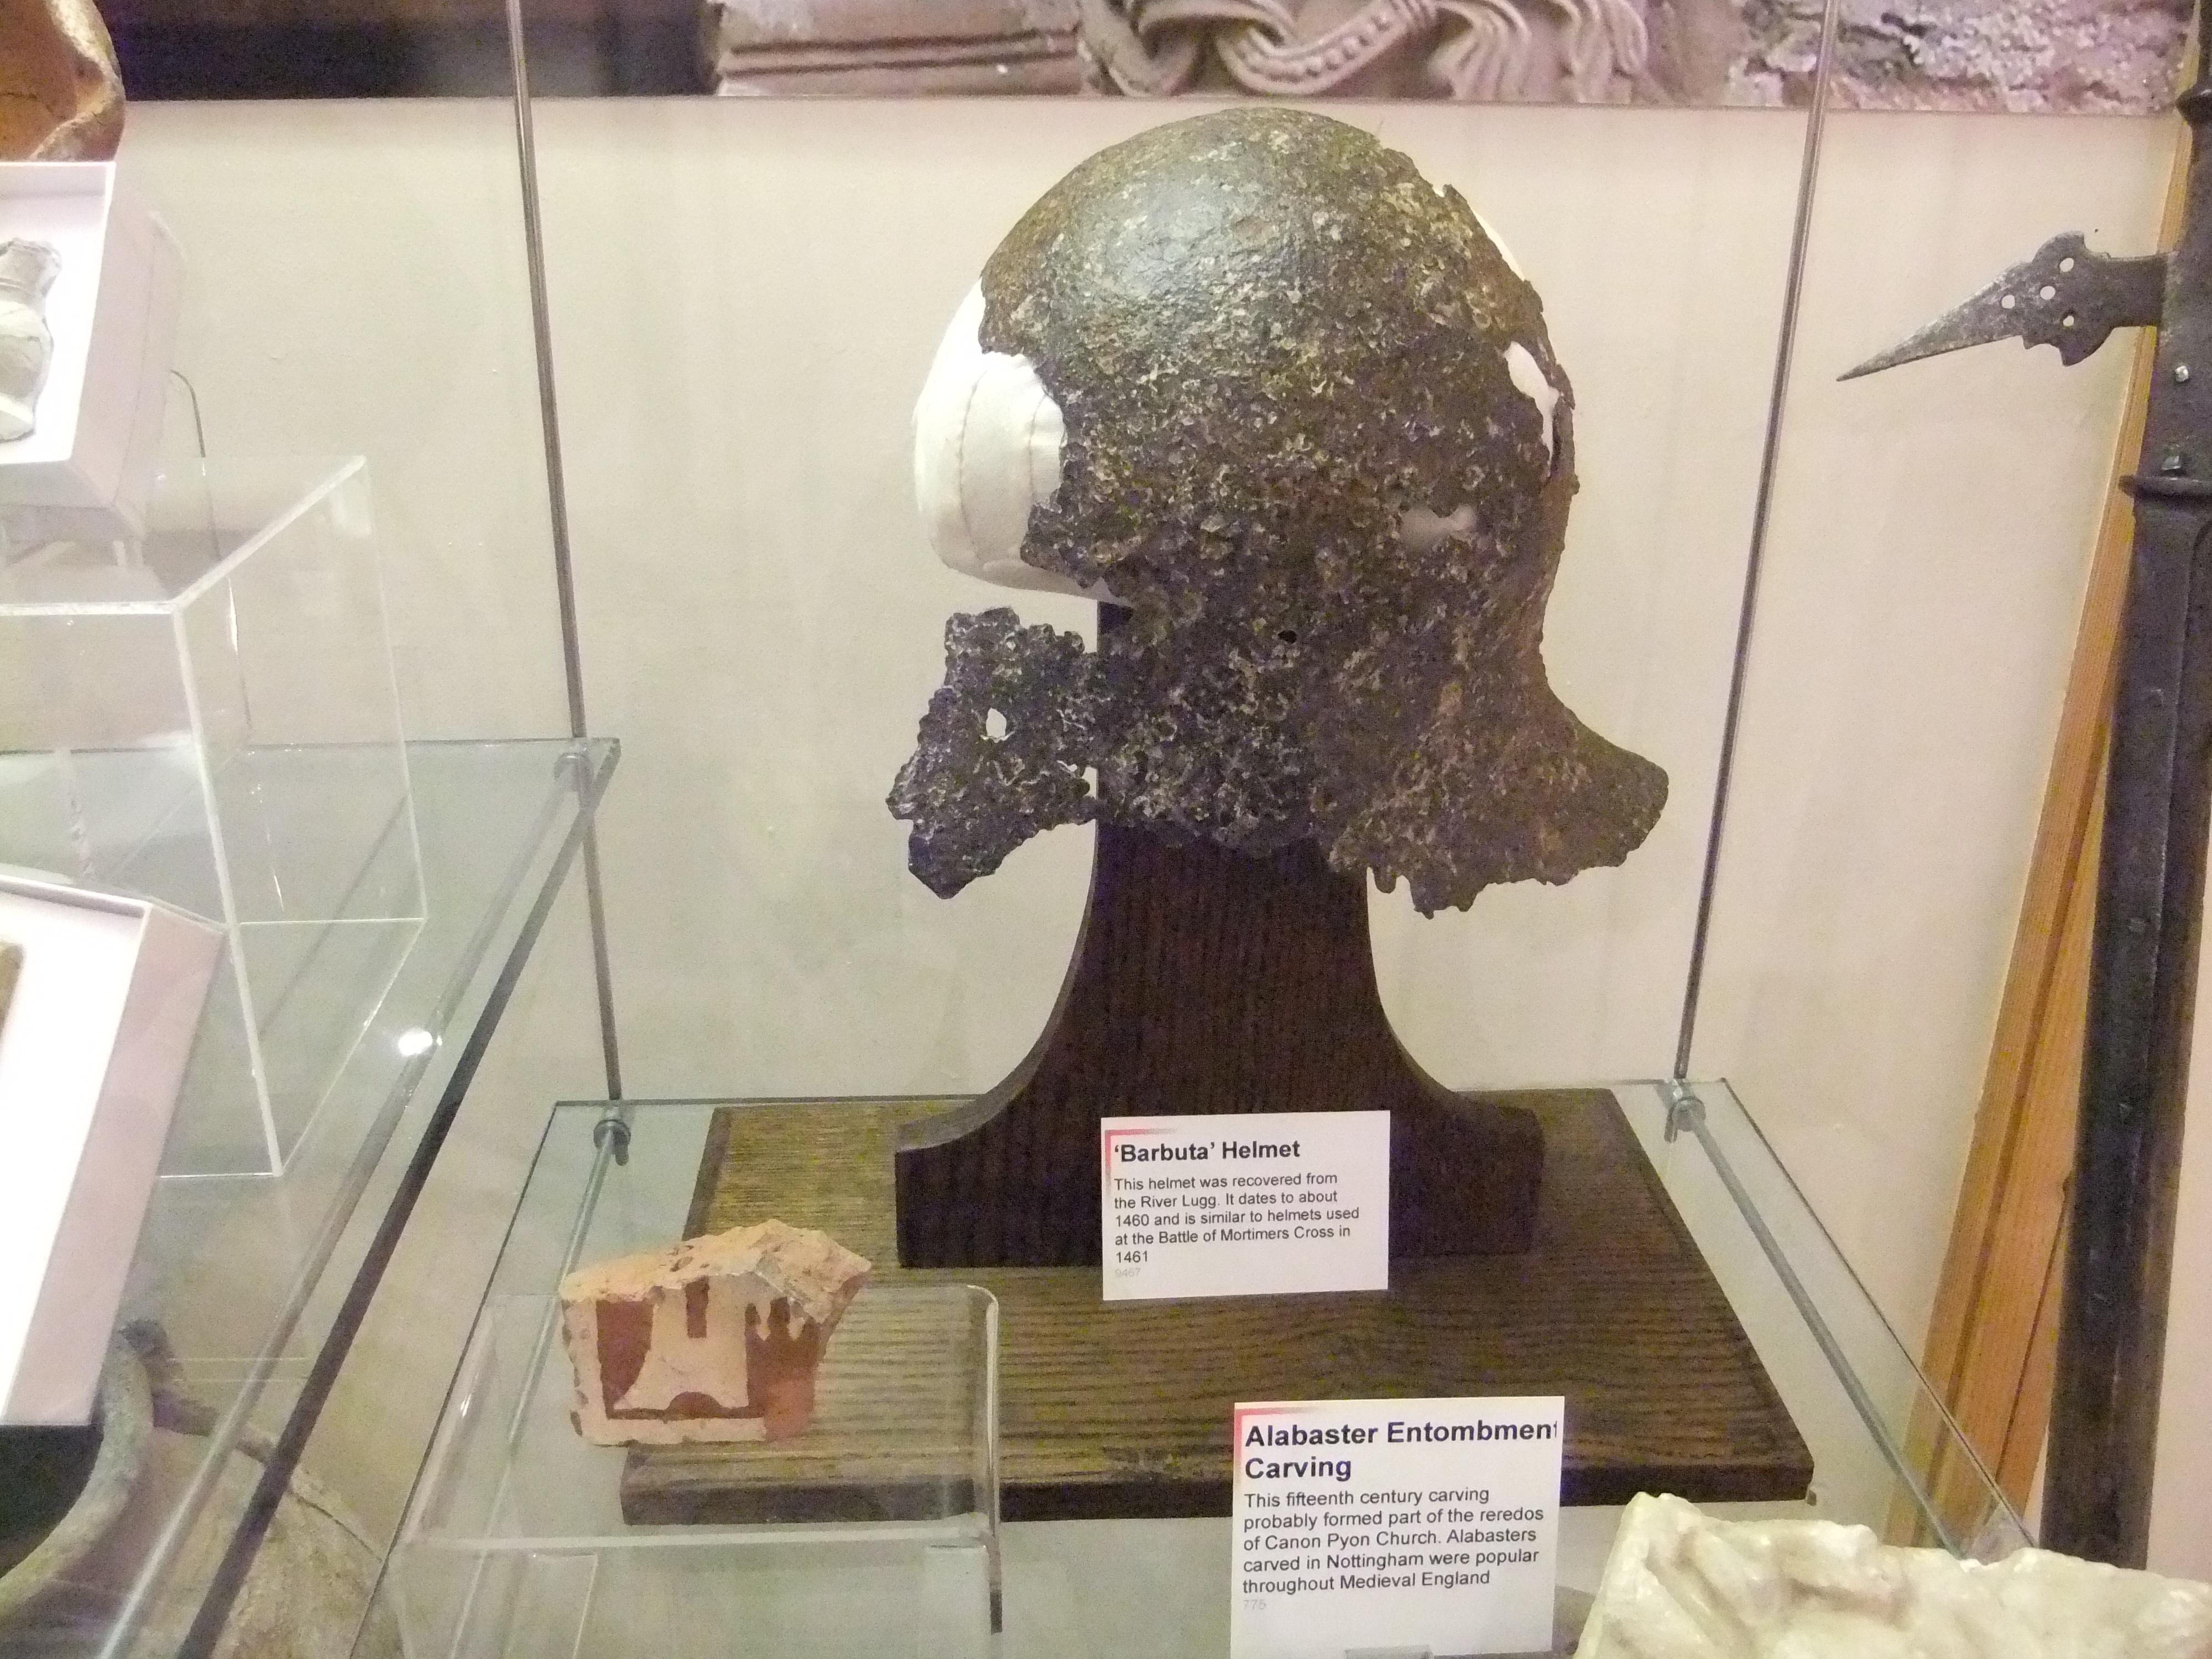 File:'Barbuta' Helmet, Hereford Museum and Art Gallery